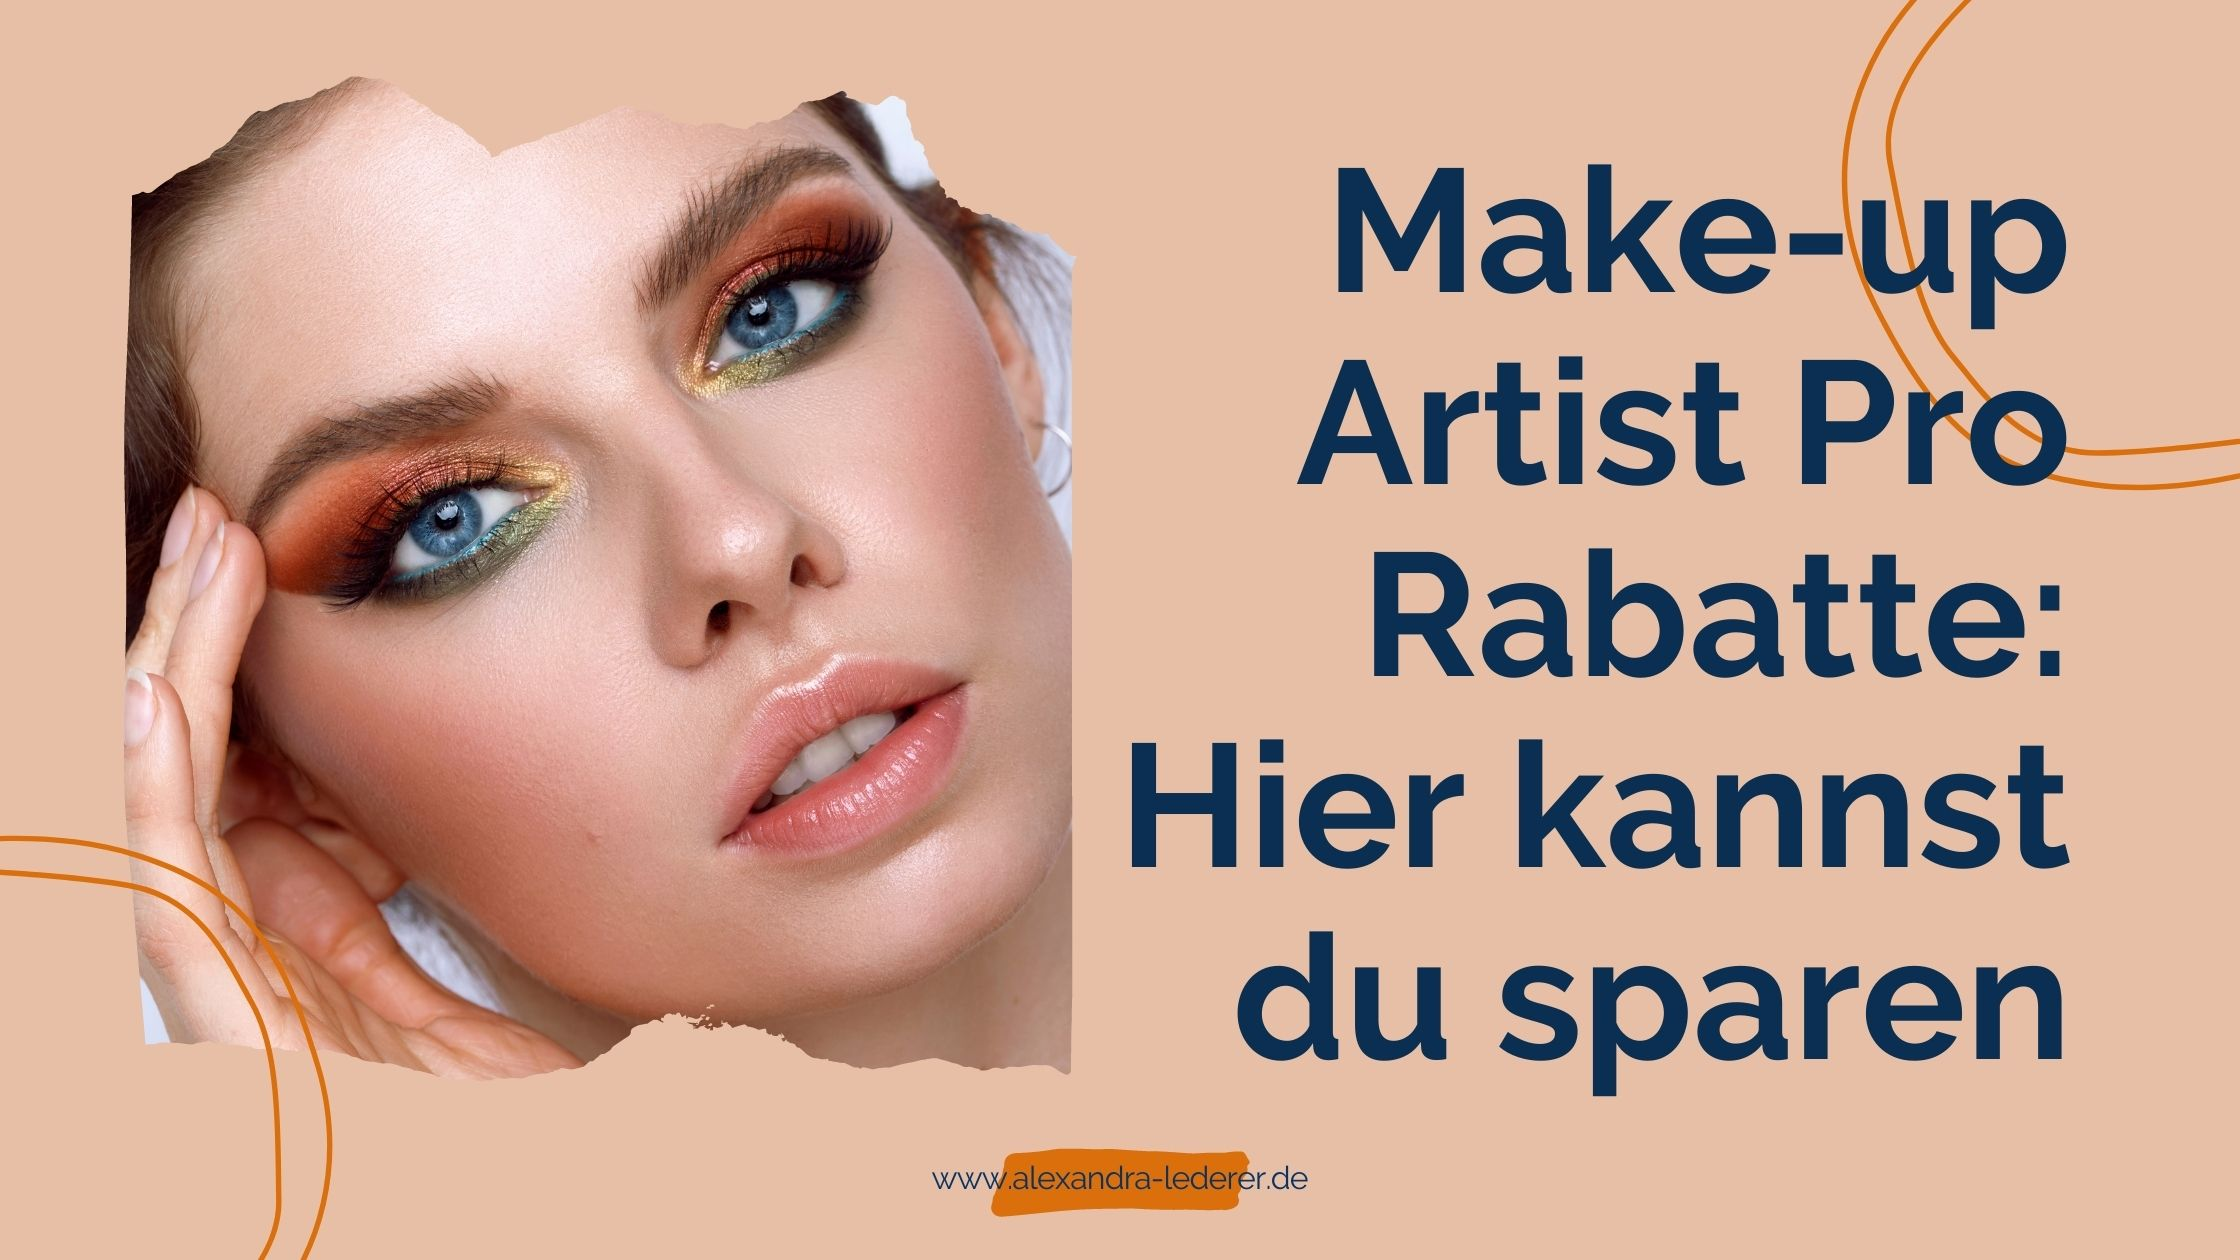 Make-up Artist Pro Programm